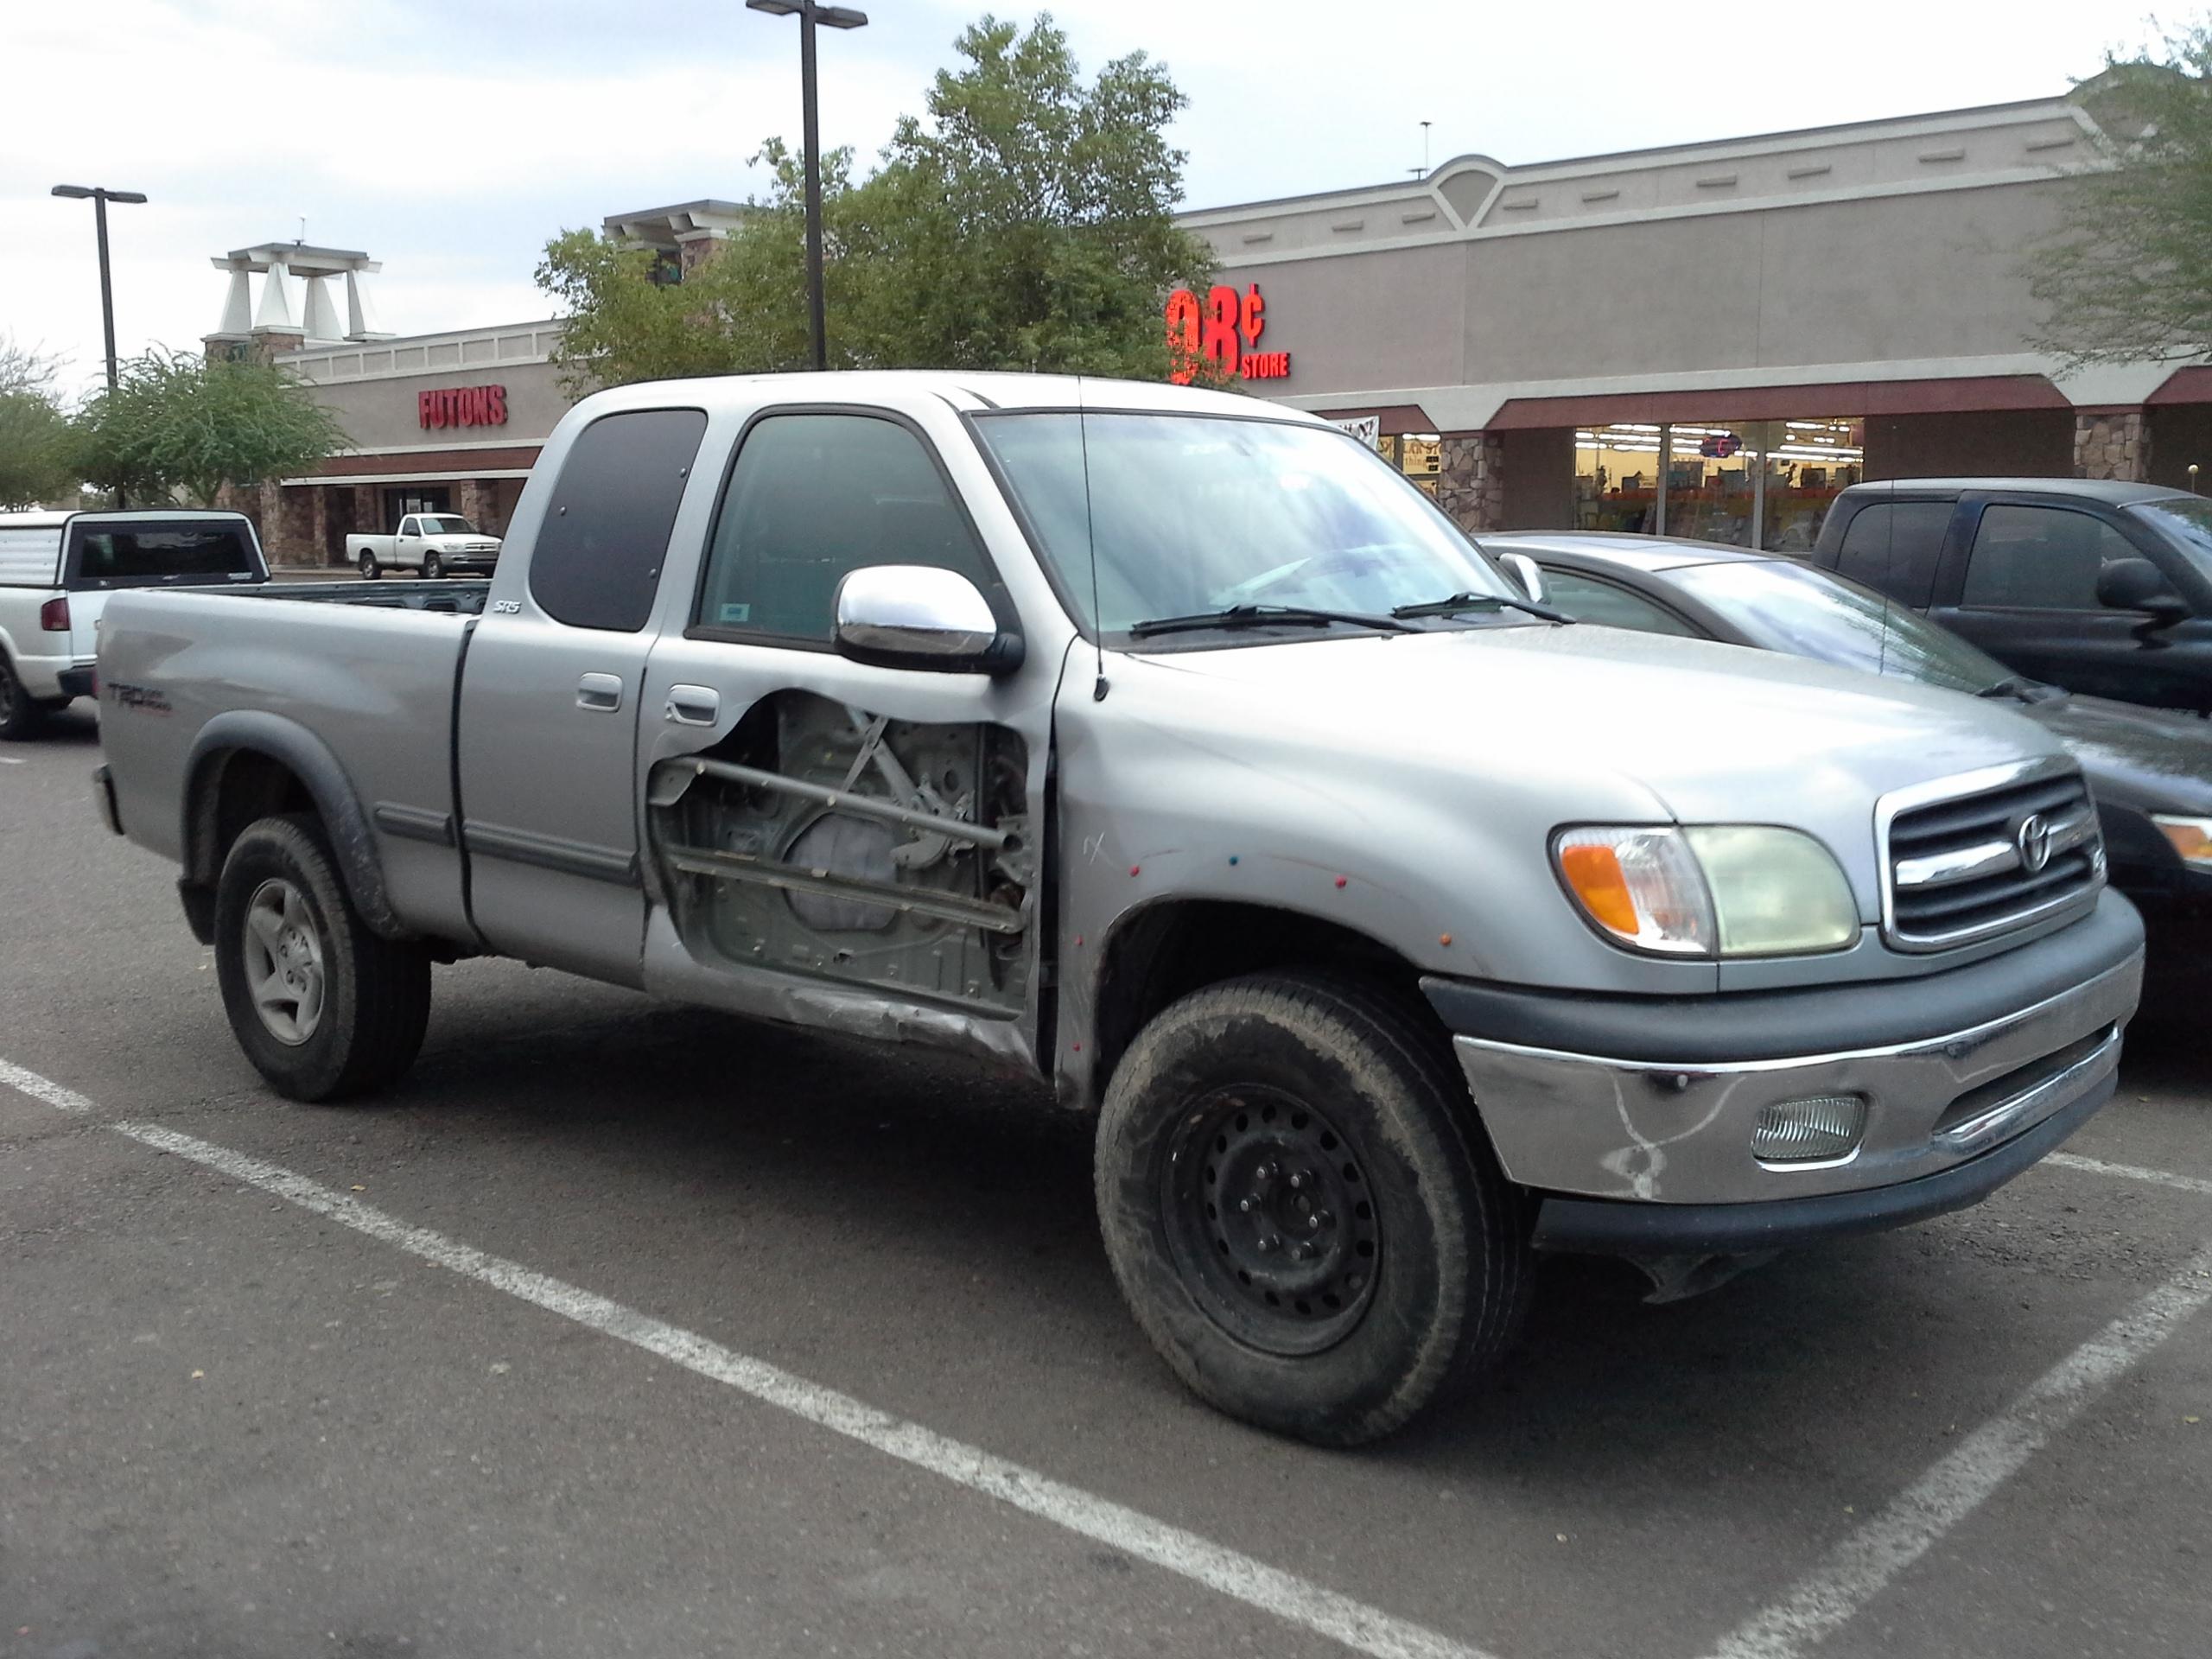 Toyota Tundra Terminator 2 Edition Genho